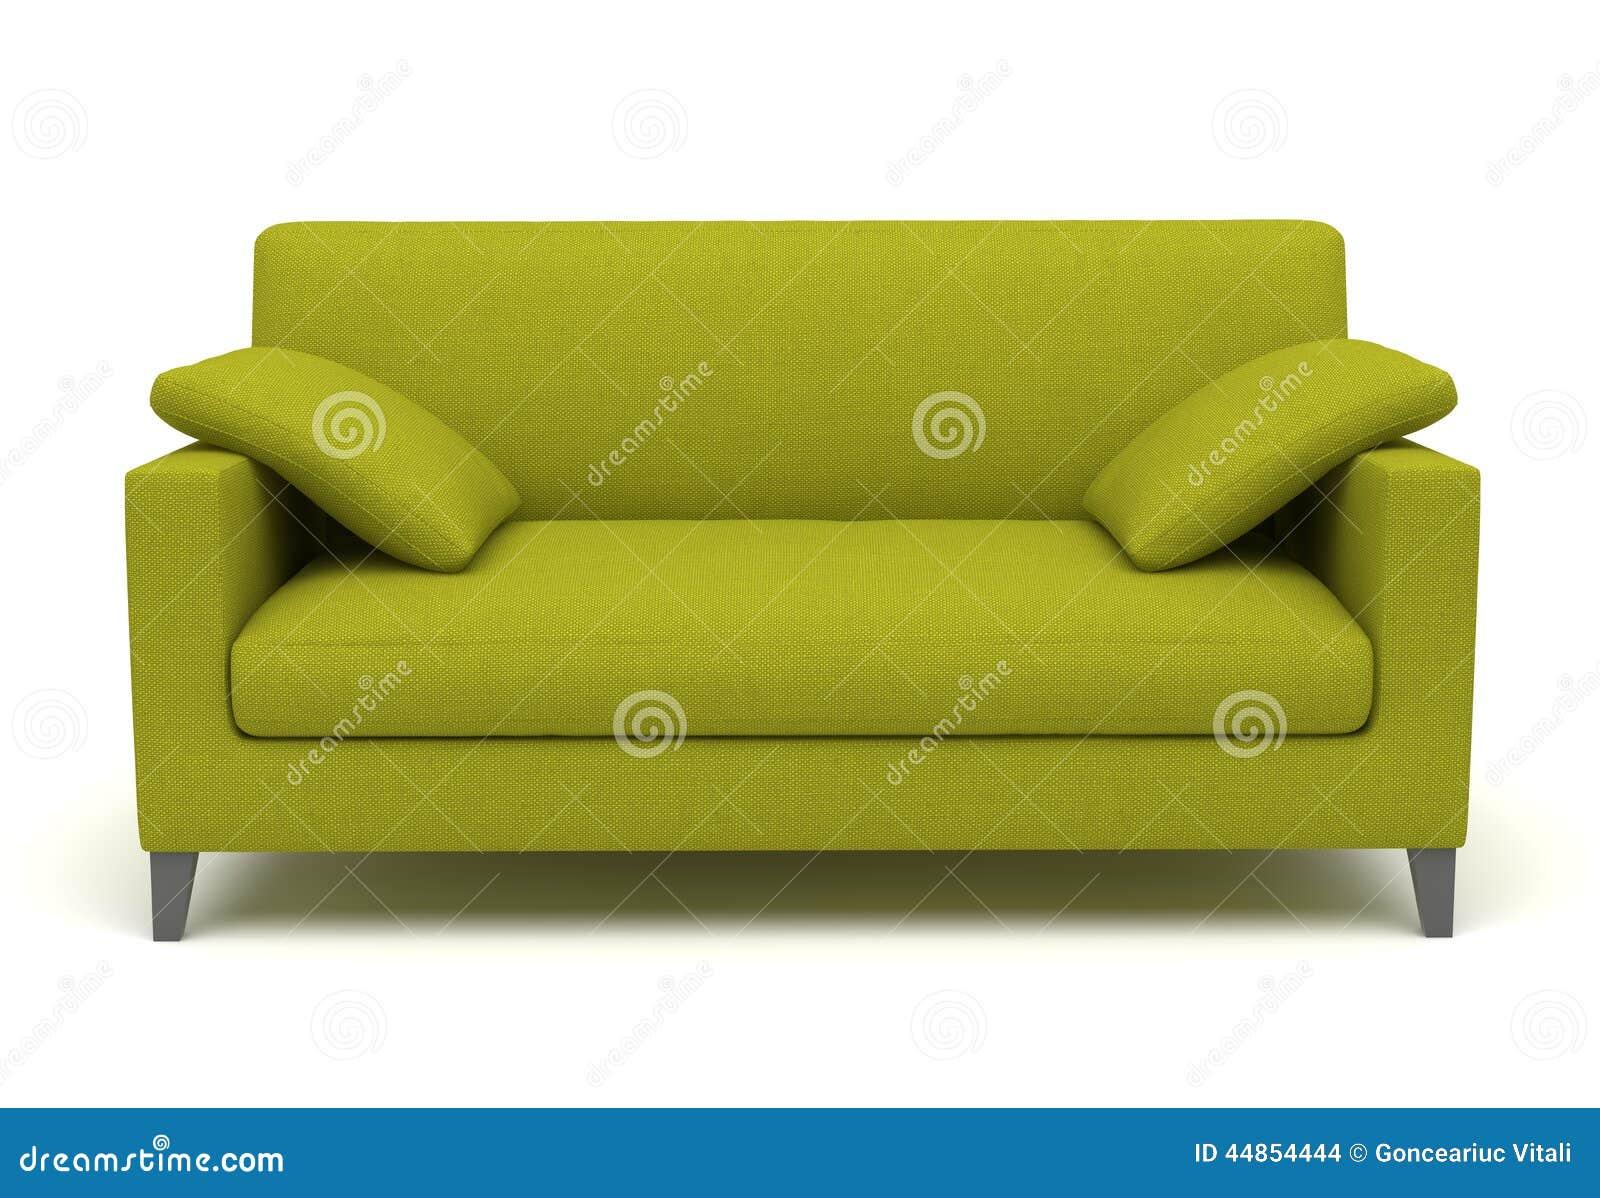 ligne roset citta sofa stock photo image 44854444. Black Bedroom Furniture Sets. Home Design Ideas